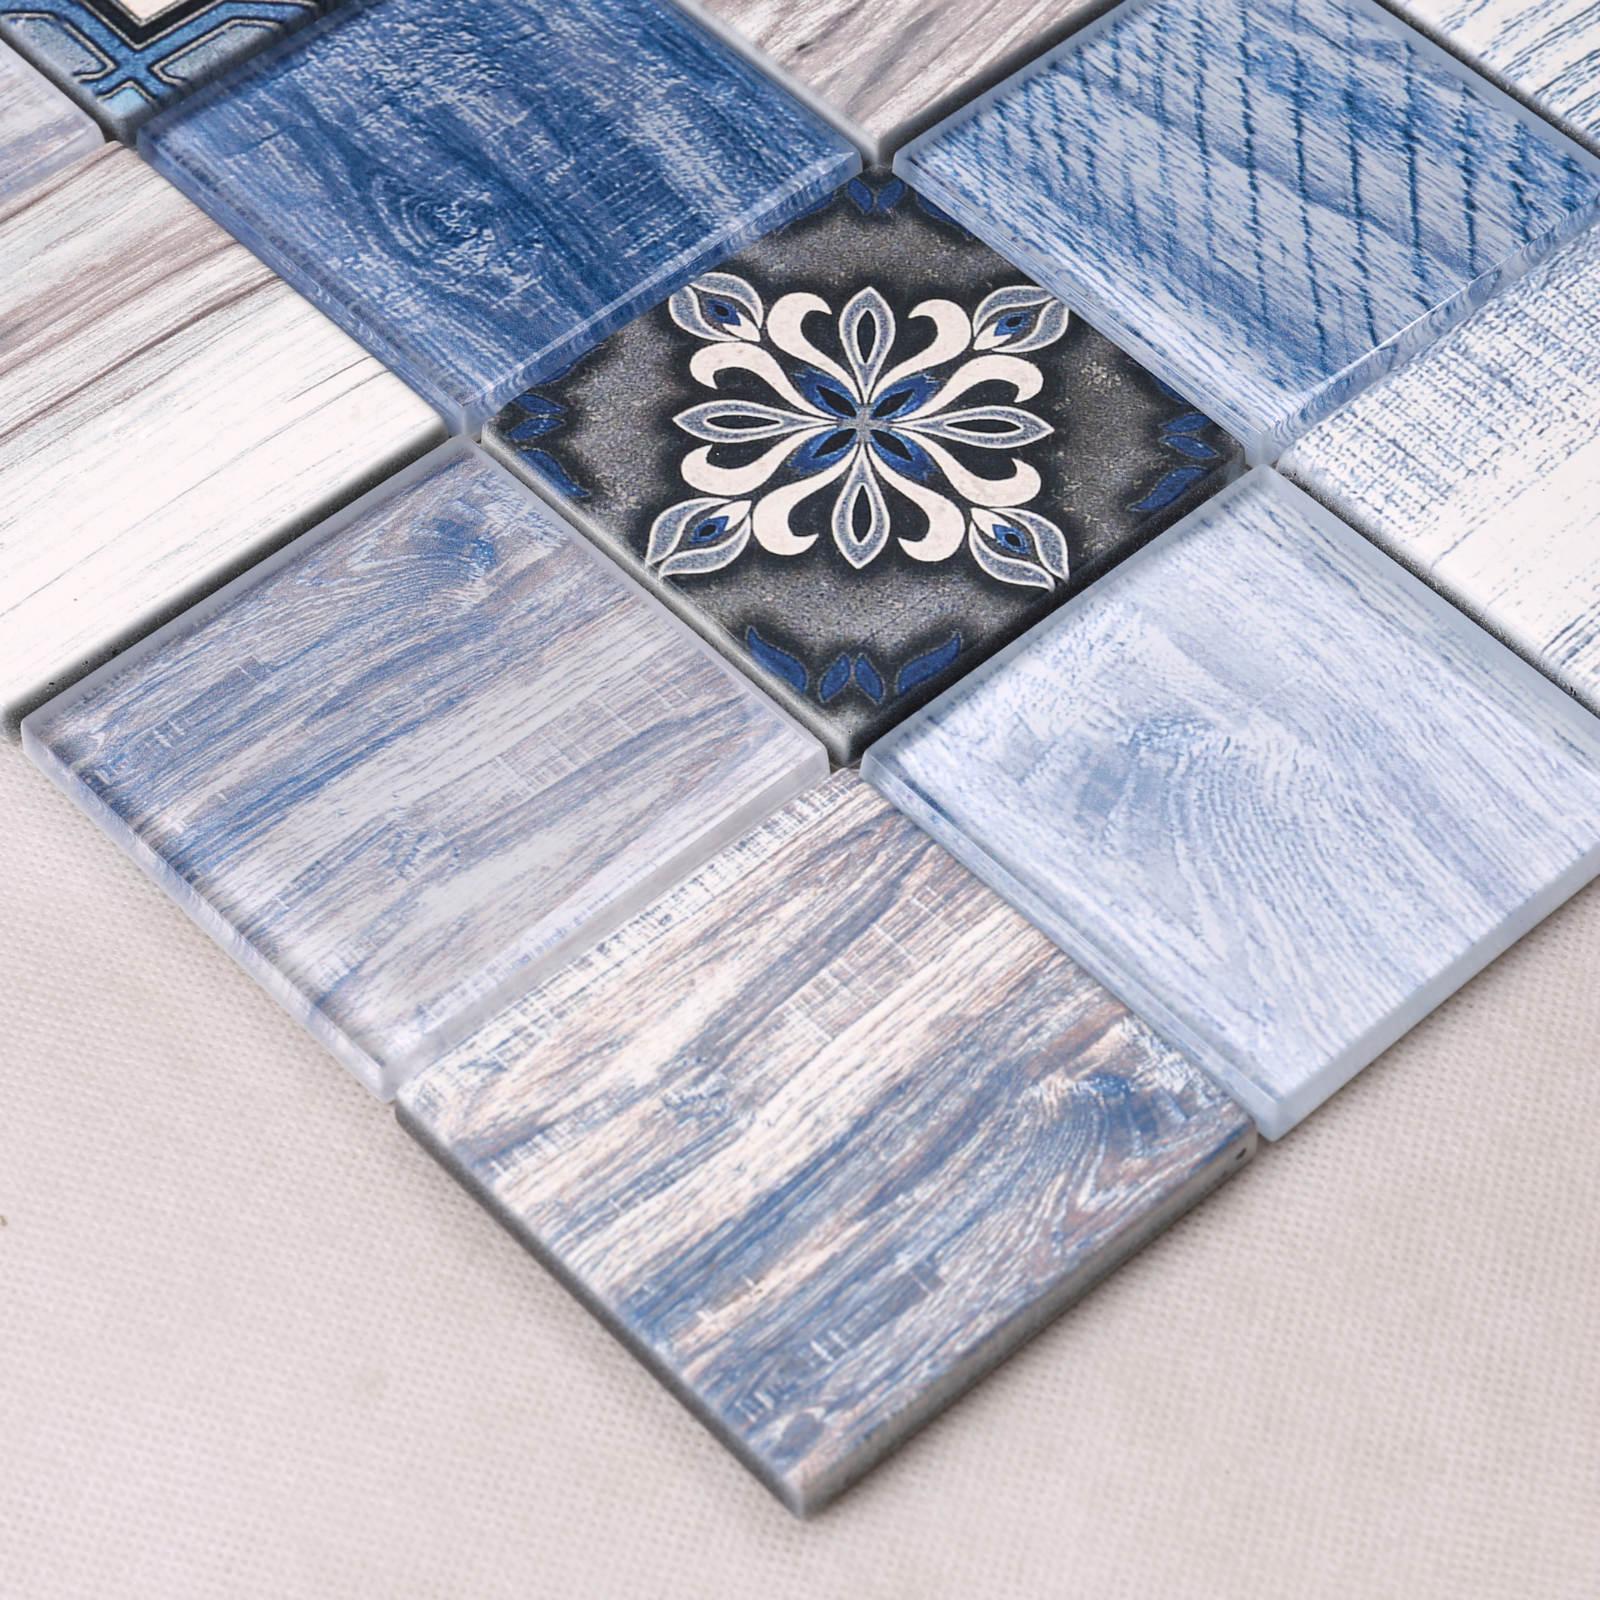 HPM01 Inkjet Printing Art Glass Mosaic Waterproof Anti Corrosion Backsplash